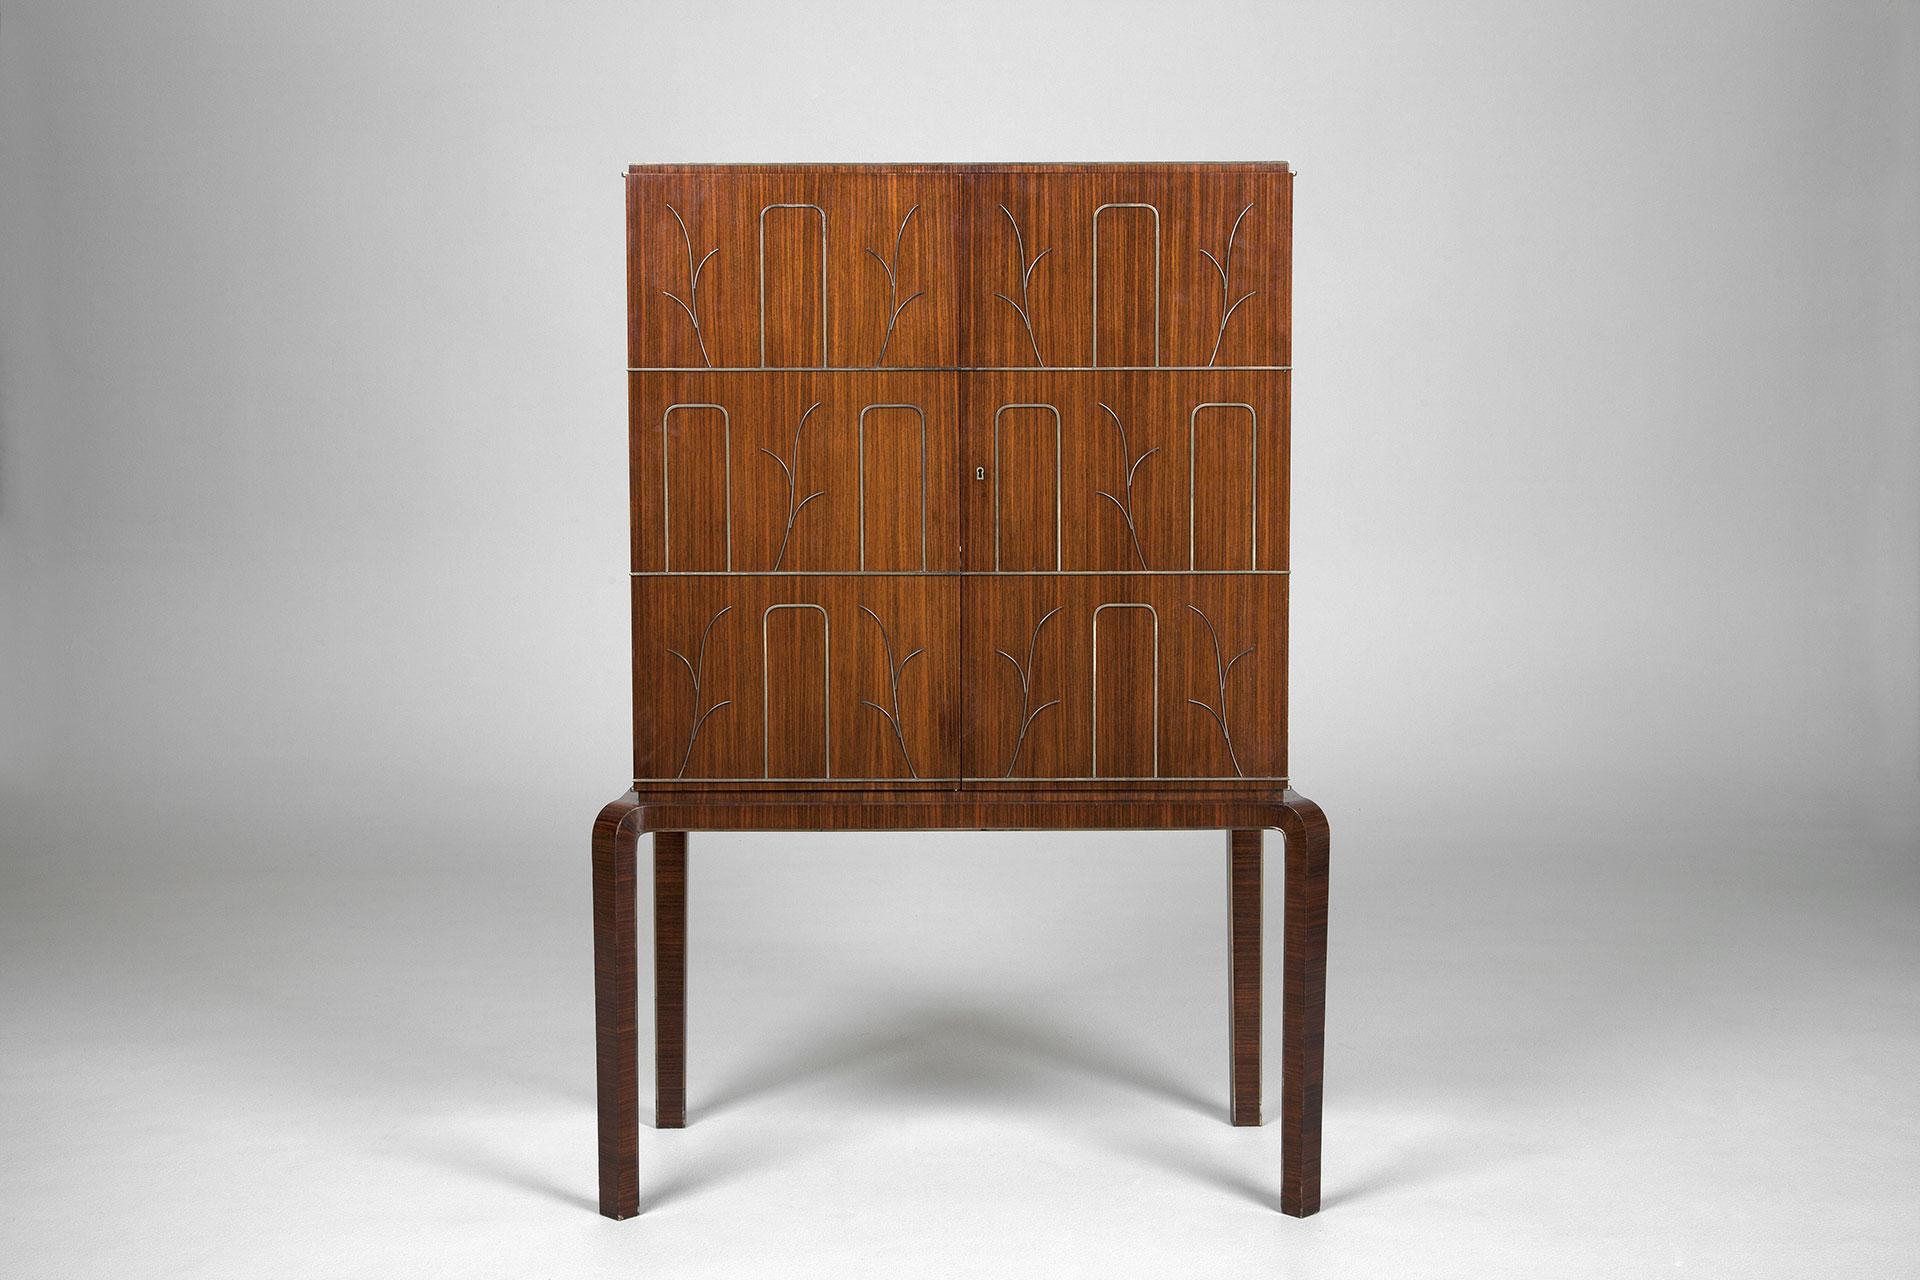 jacksons paris 1937 cabinet axel einar hjorth. Black Bedroom Furniture Sets. Home Design Ideas